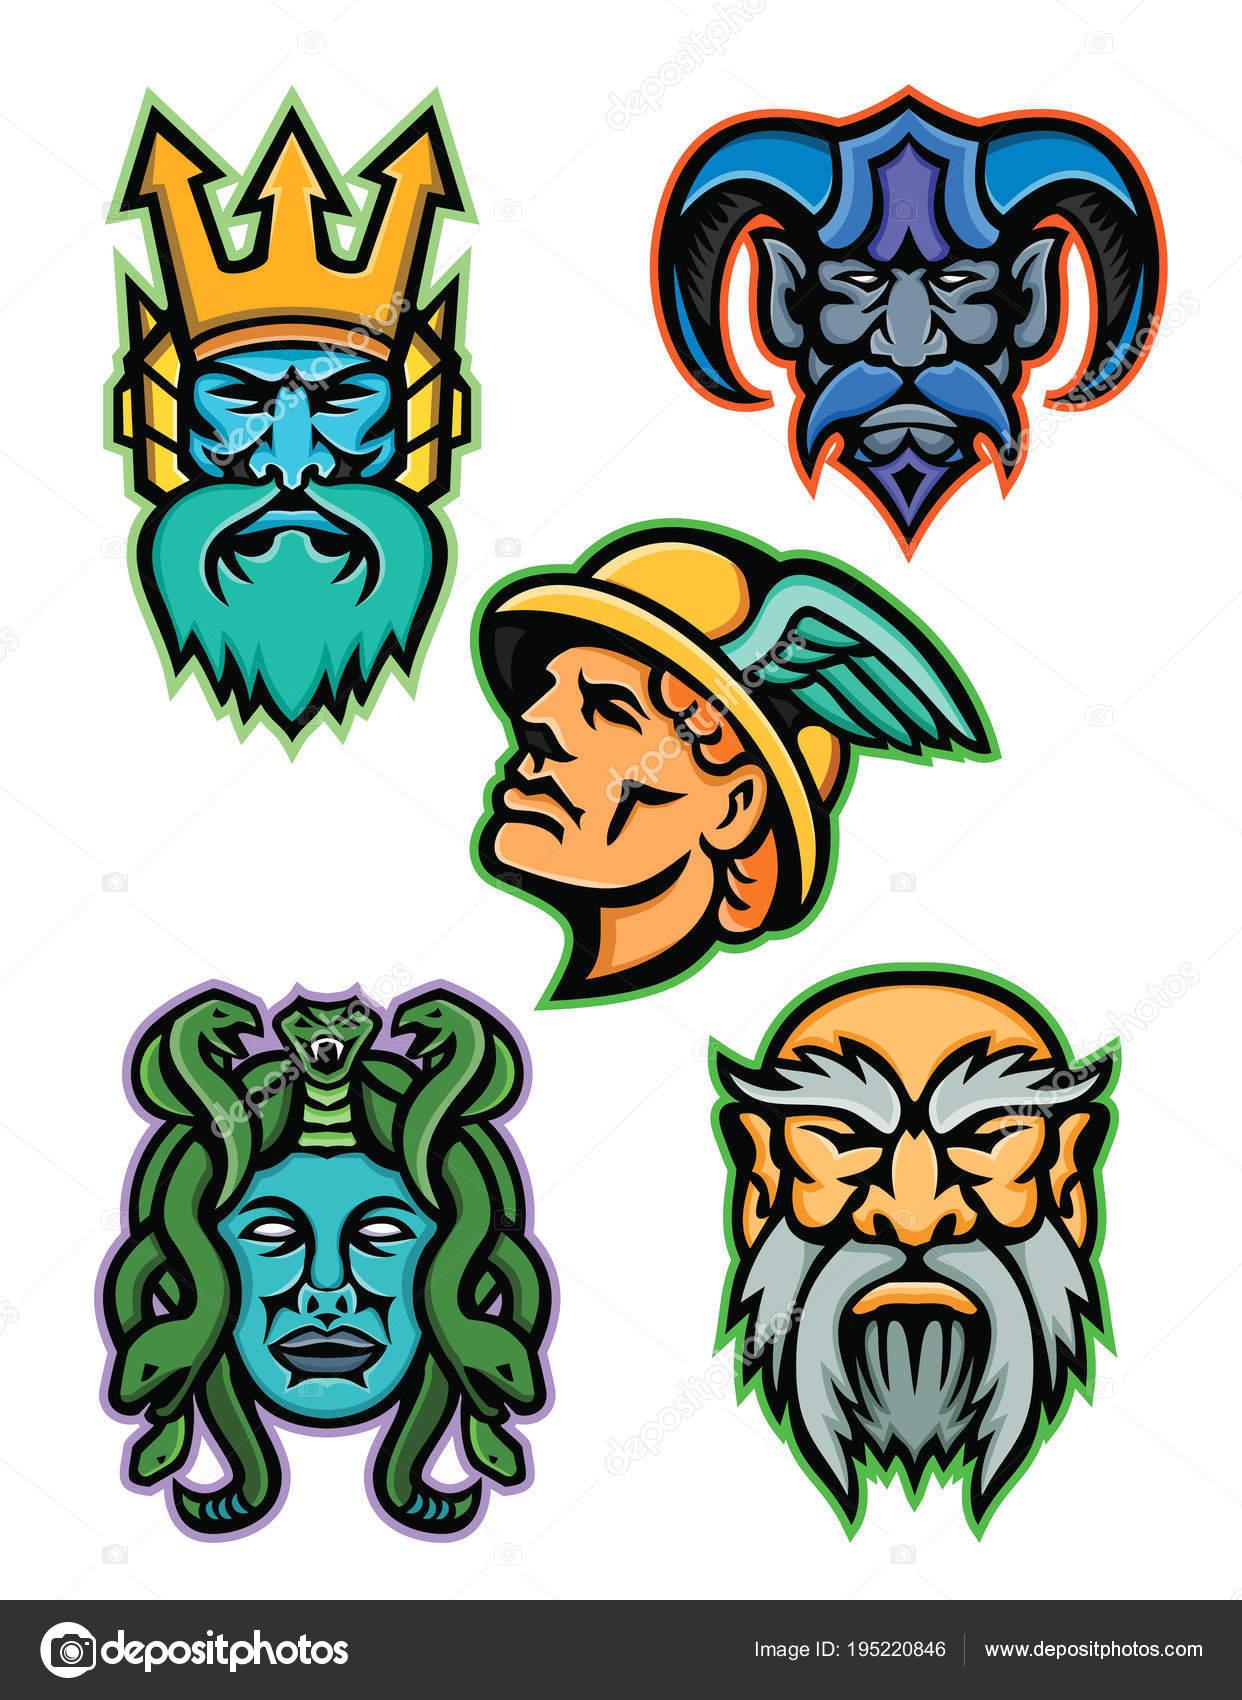 greek mythology characters